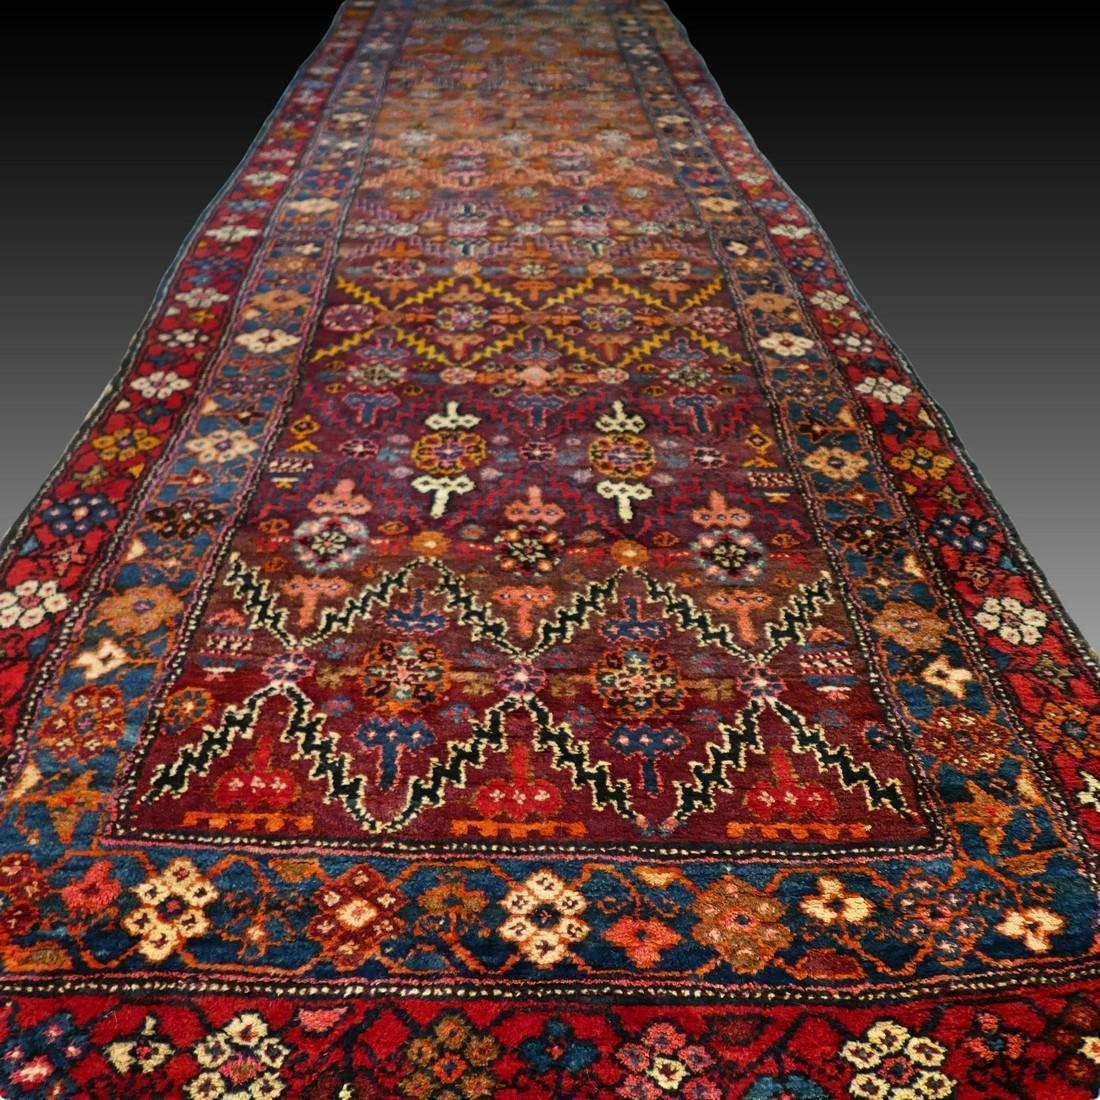 Impressive antique tribal Kazak runner - 13.2 x 3.8 -